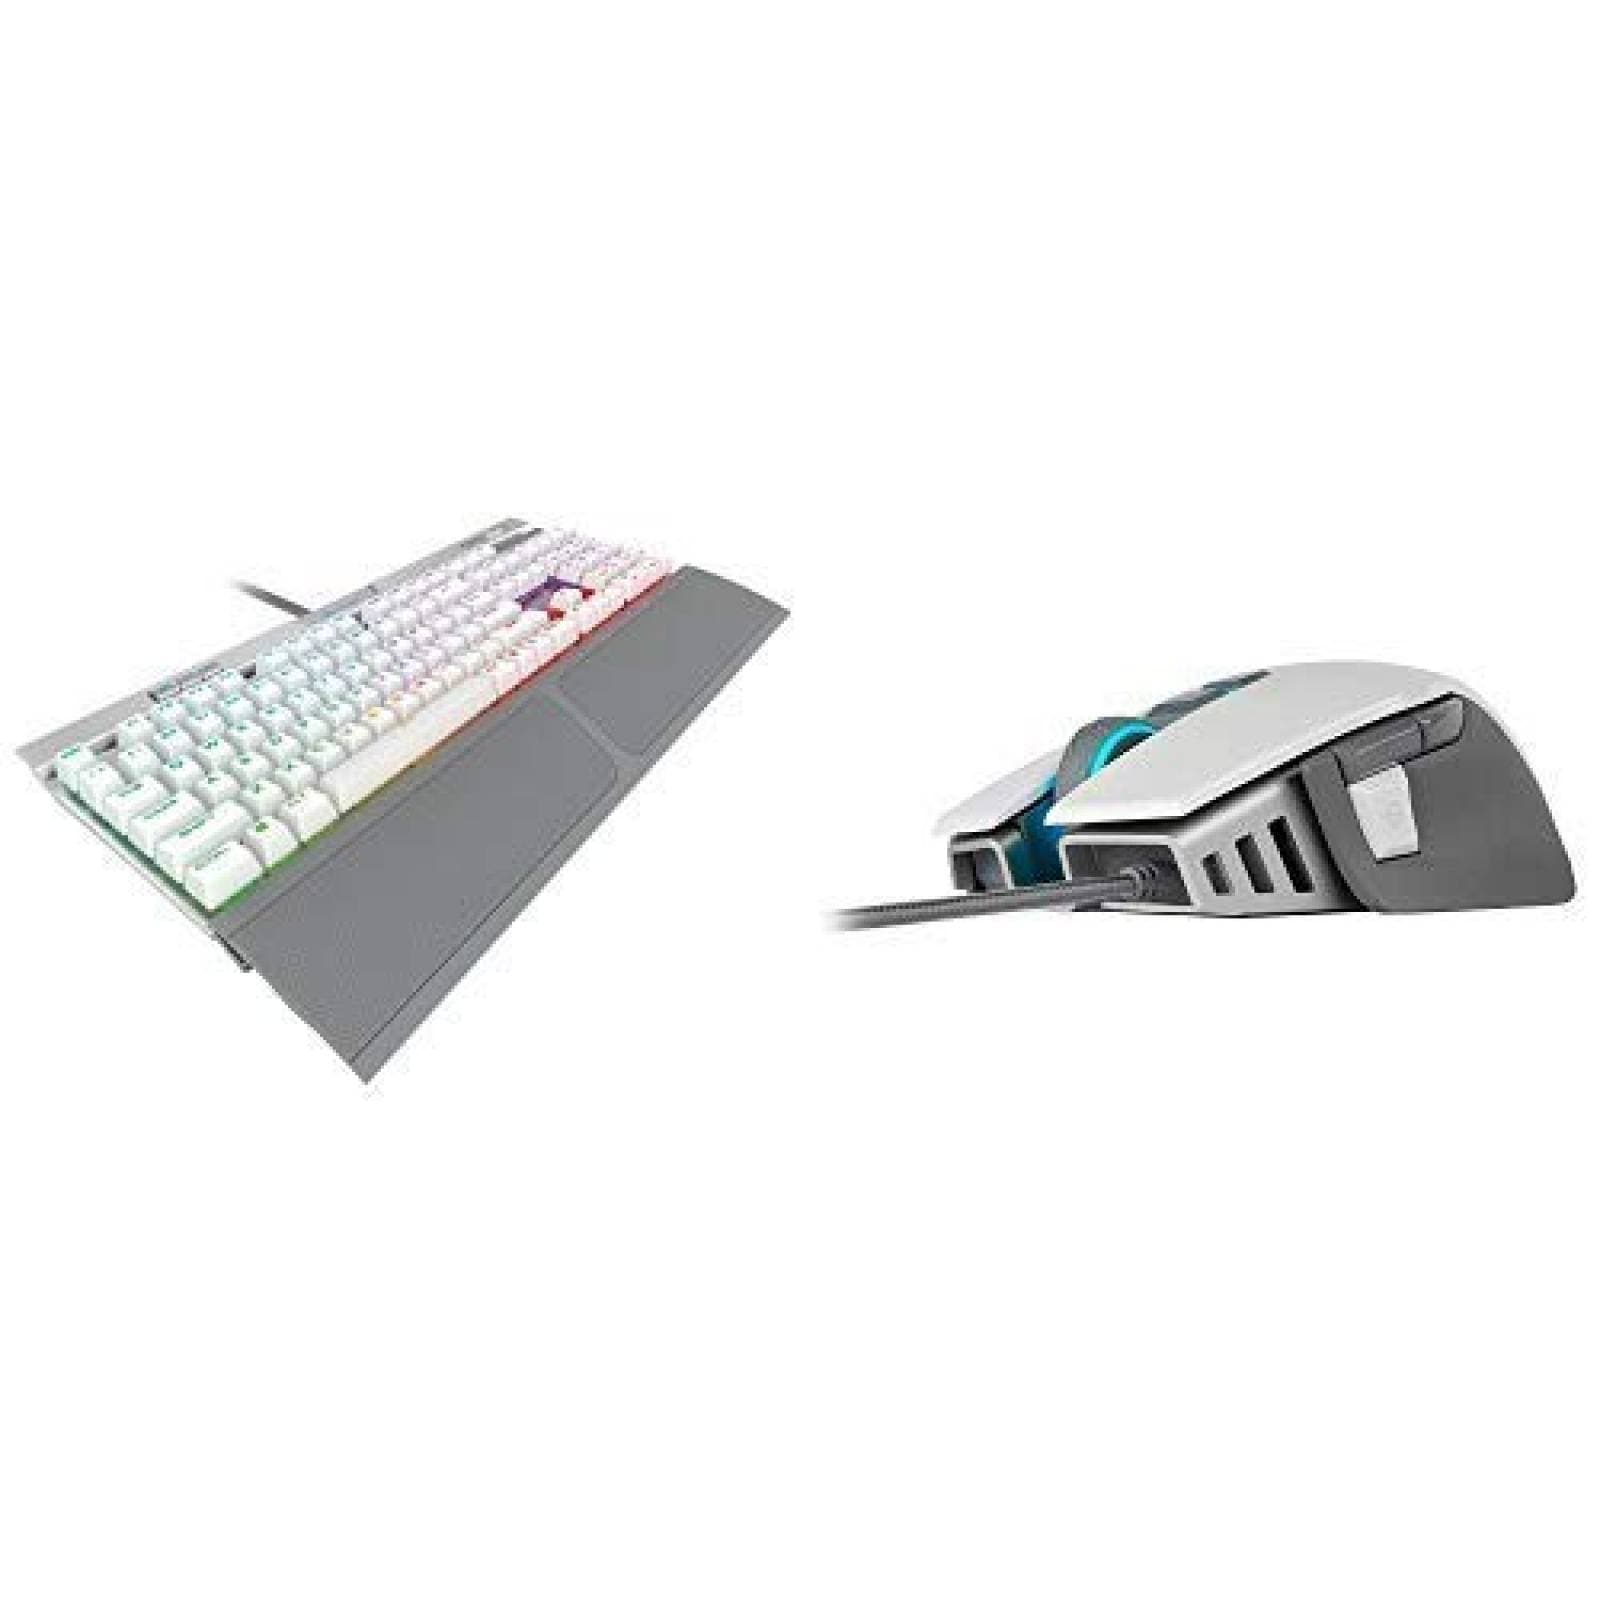 Kit Corsair K70 RGB Teclado Mecanico y Mouse M65 ELITE